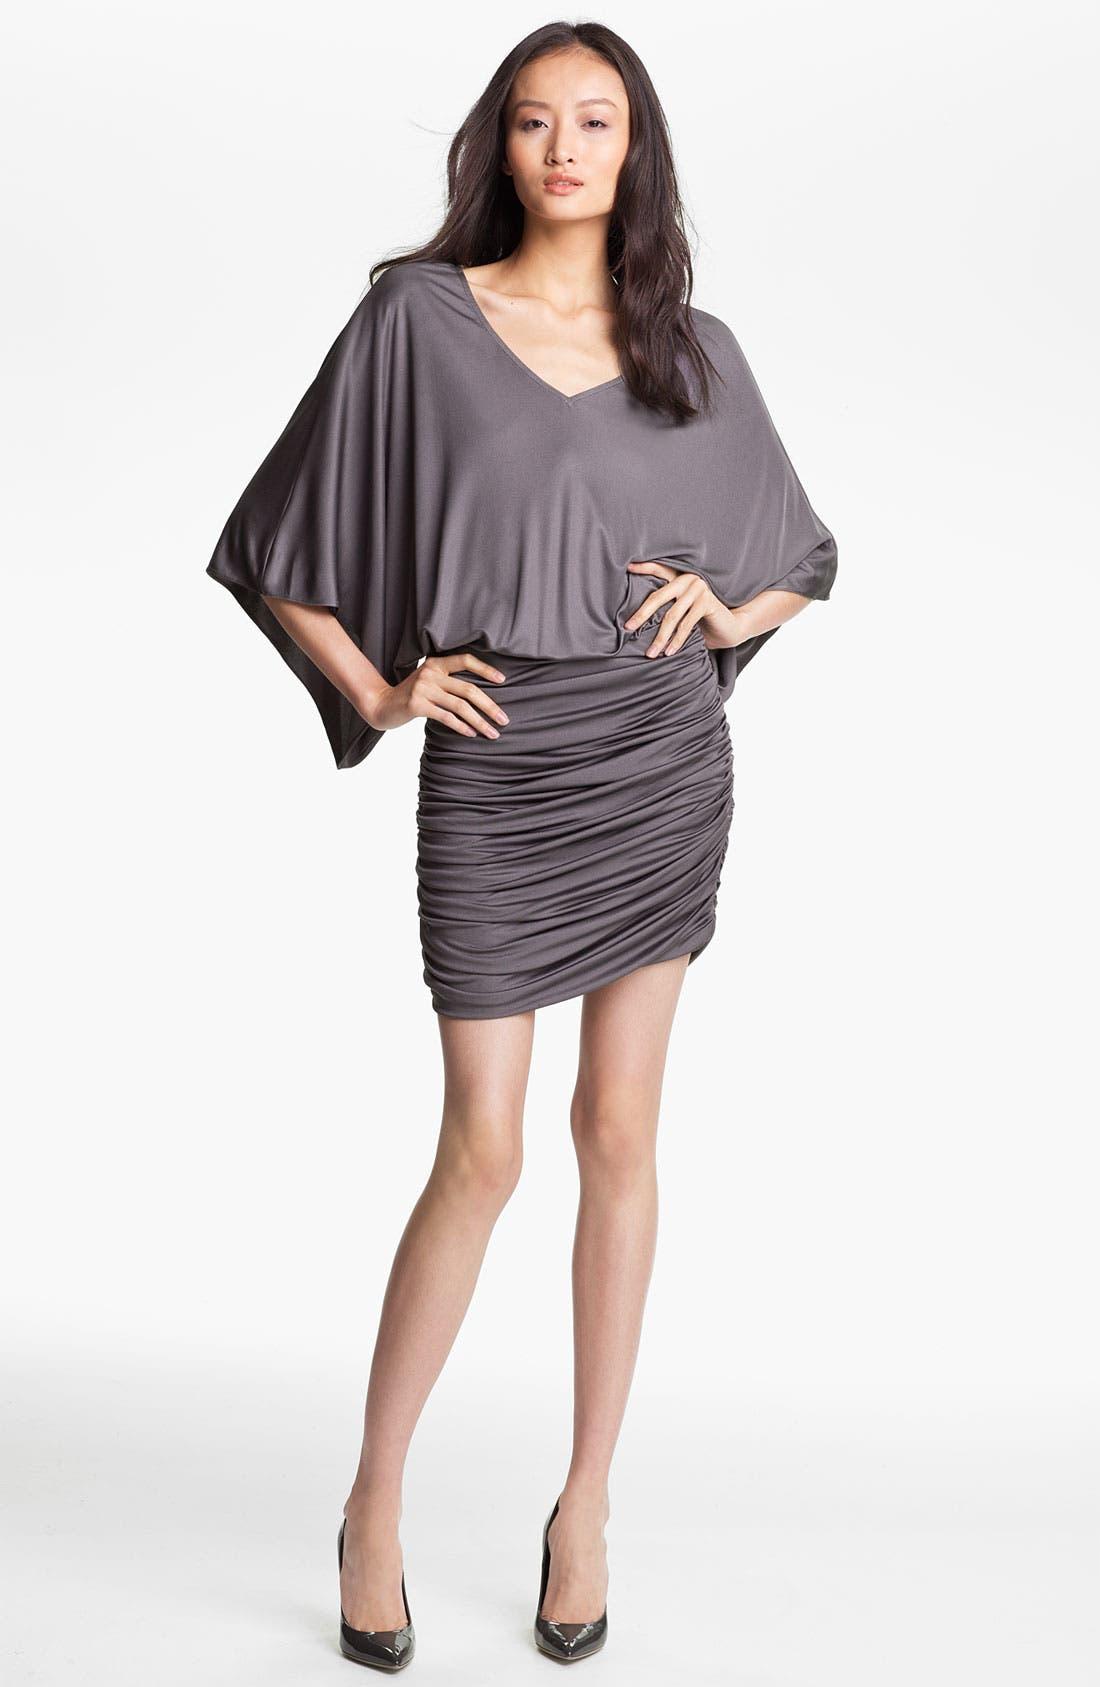 Alternate Image 1 Selected - Jay Godfrey 'Marea' Ruched Skirt Dress